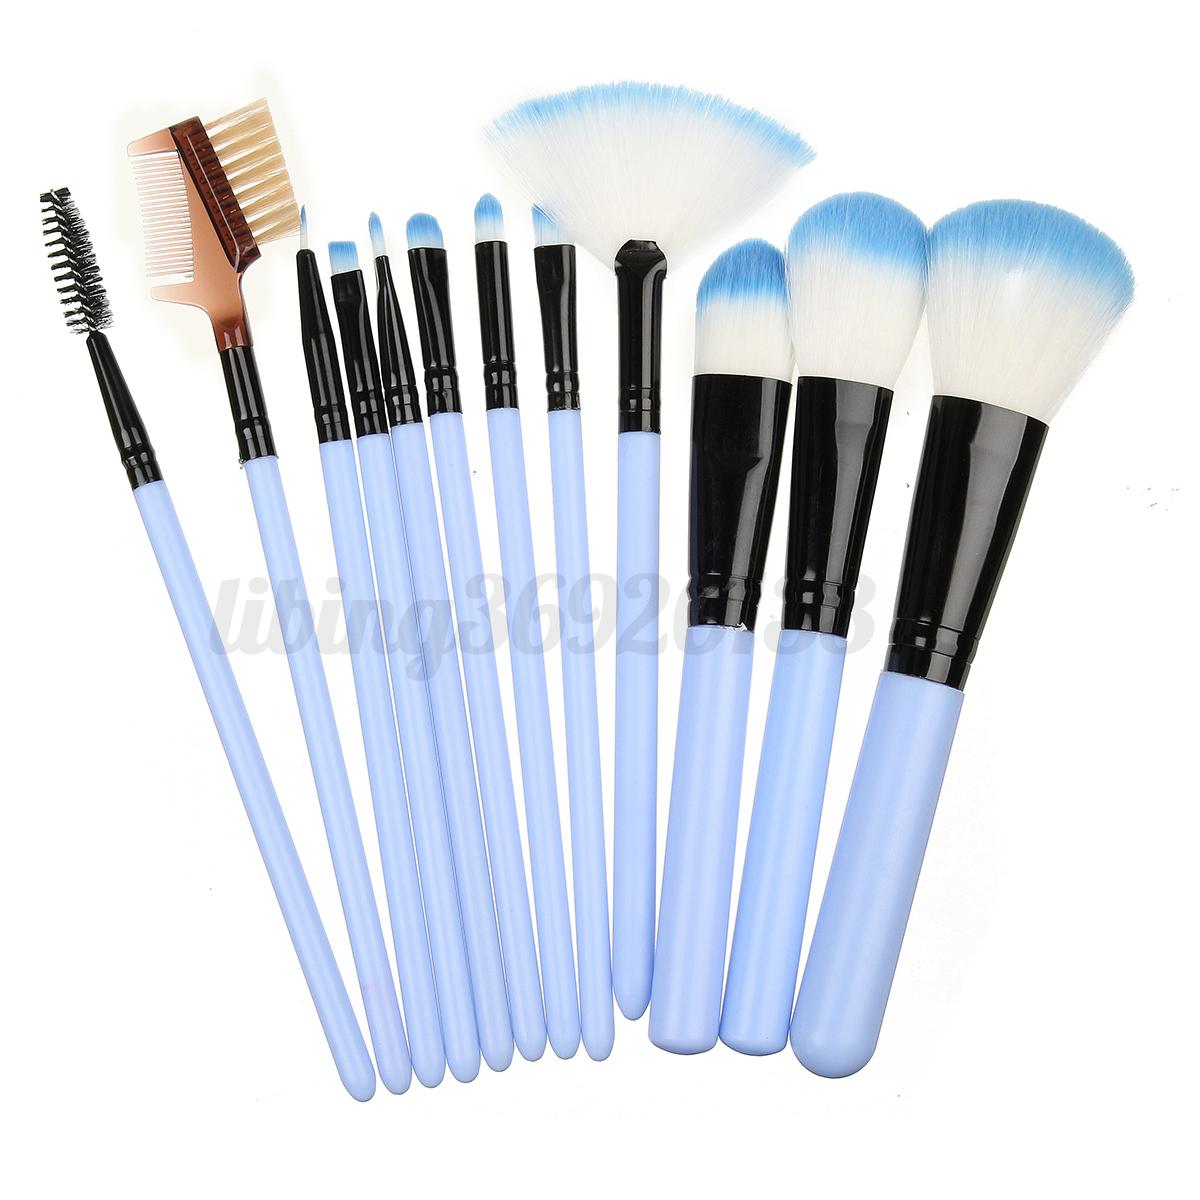 kit 12pcs professionnel pinceaux brosse base maquillage cosm tiques cylindre ebay. Black Bedroom Furniture Sets. Home Design Ideas